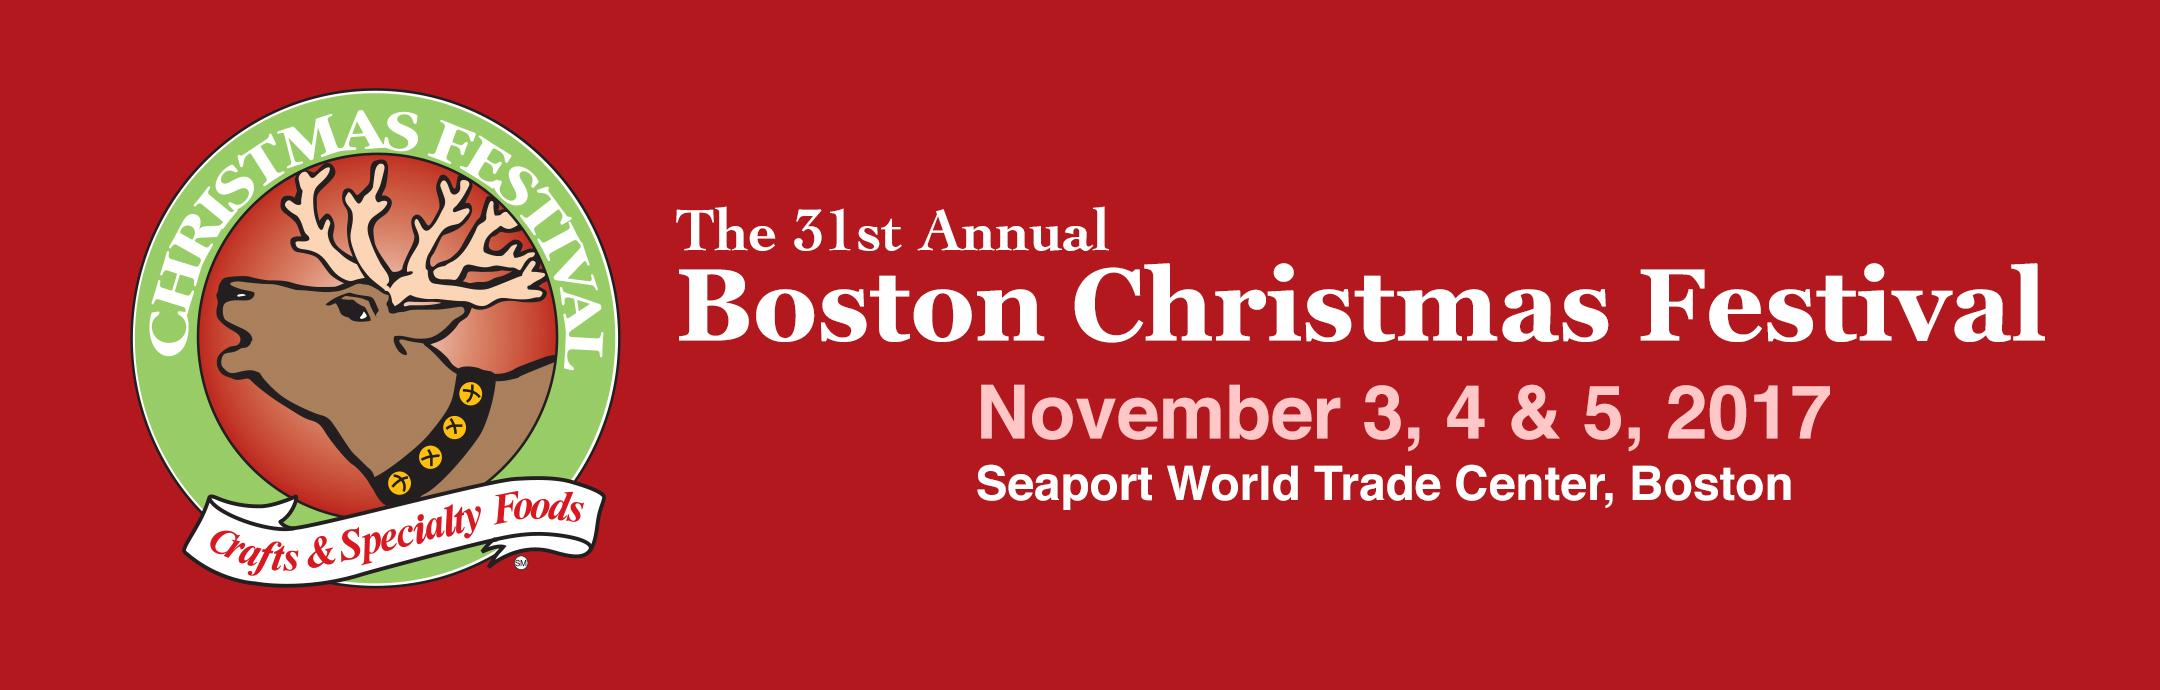 Boston christmas festival tickets fri nov 3 2017 at 12 for Craft fair boston 2017